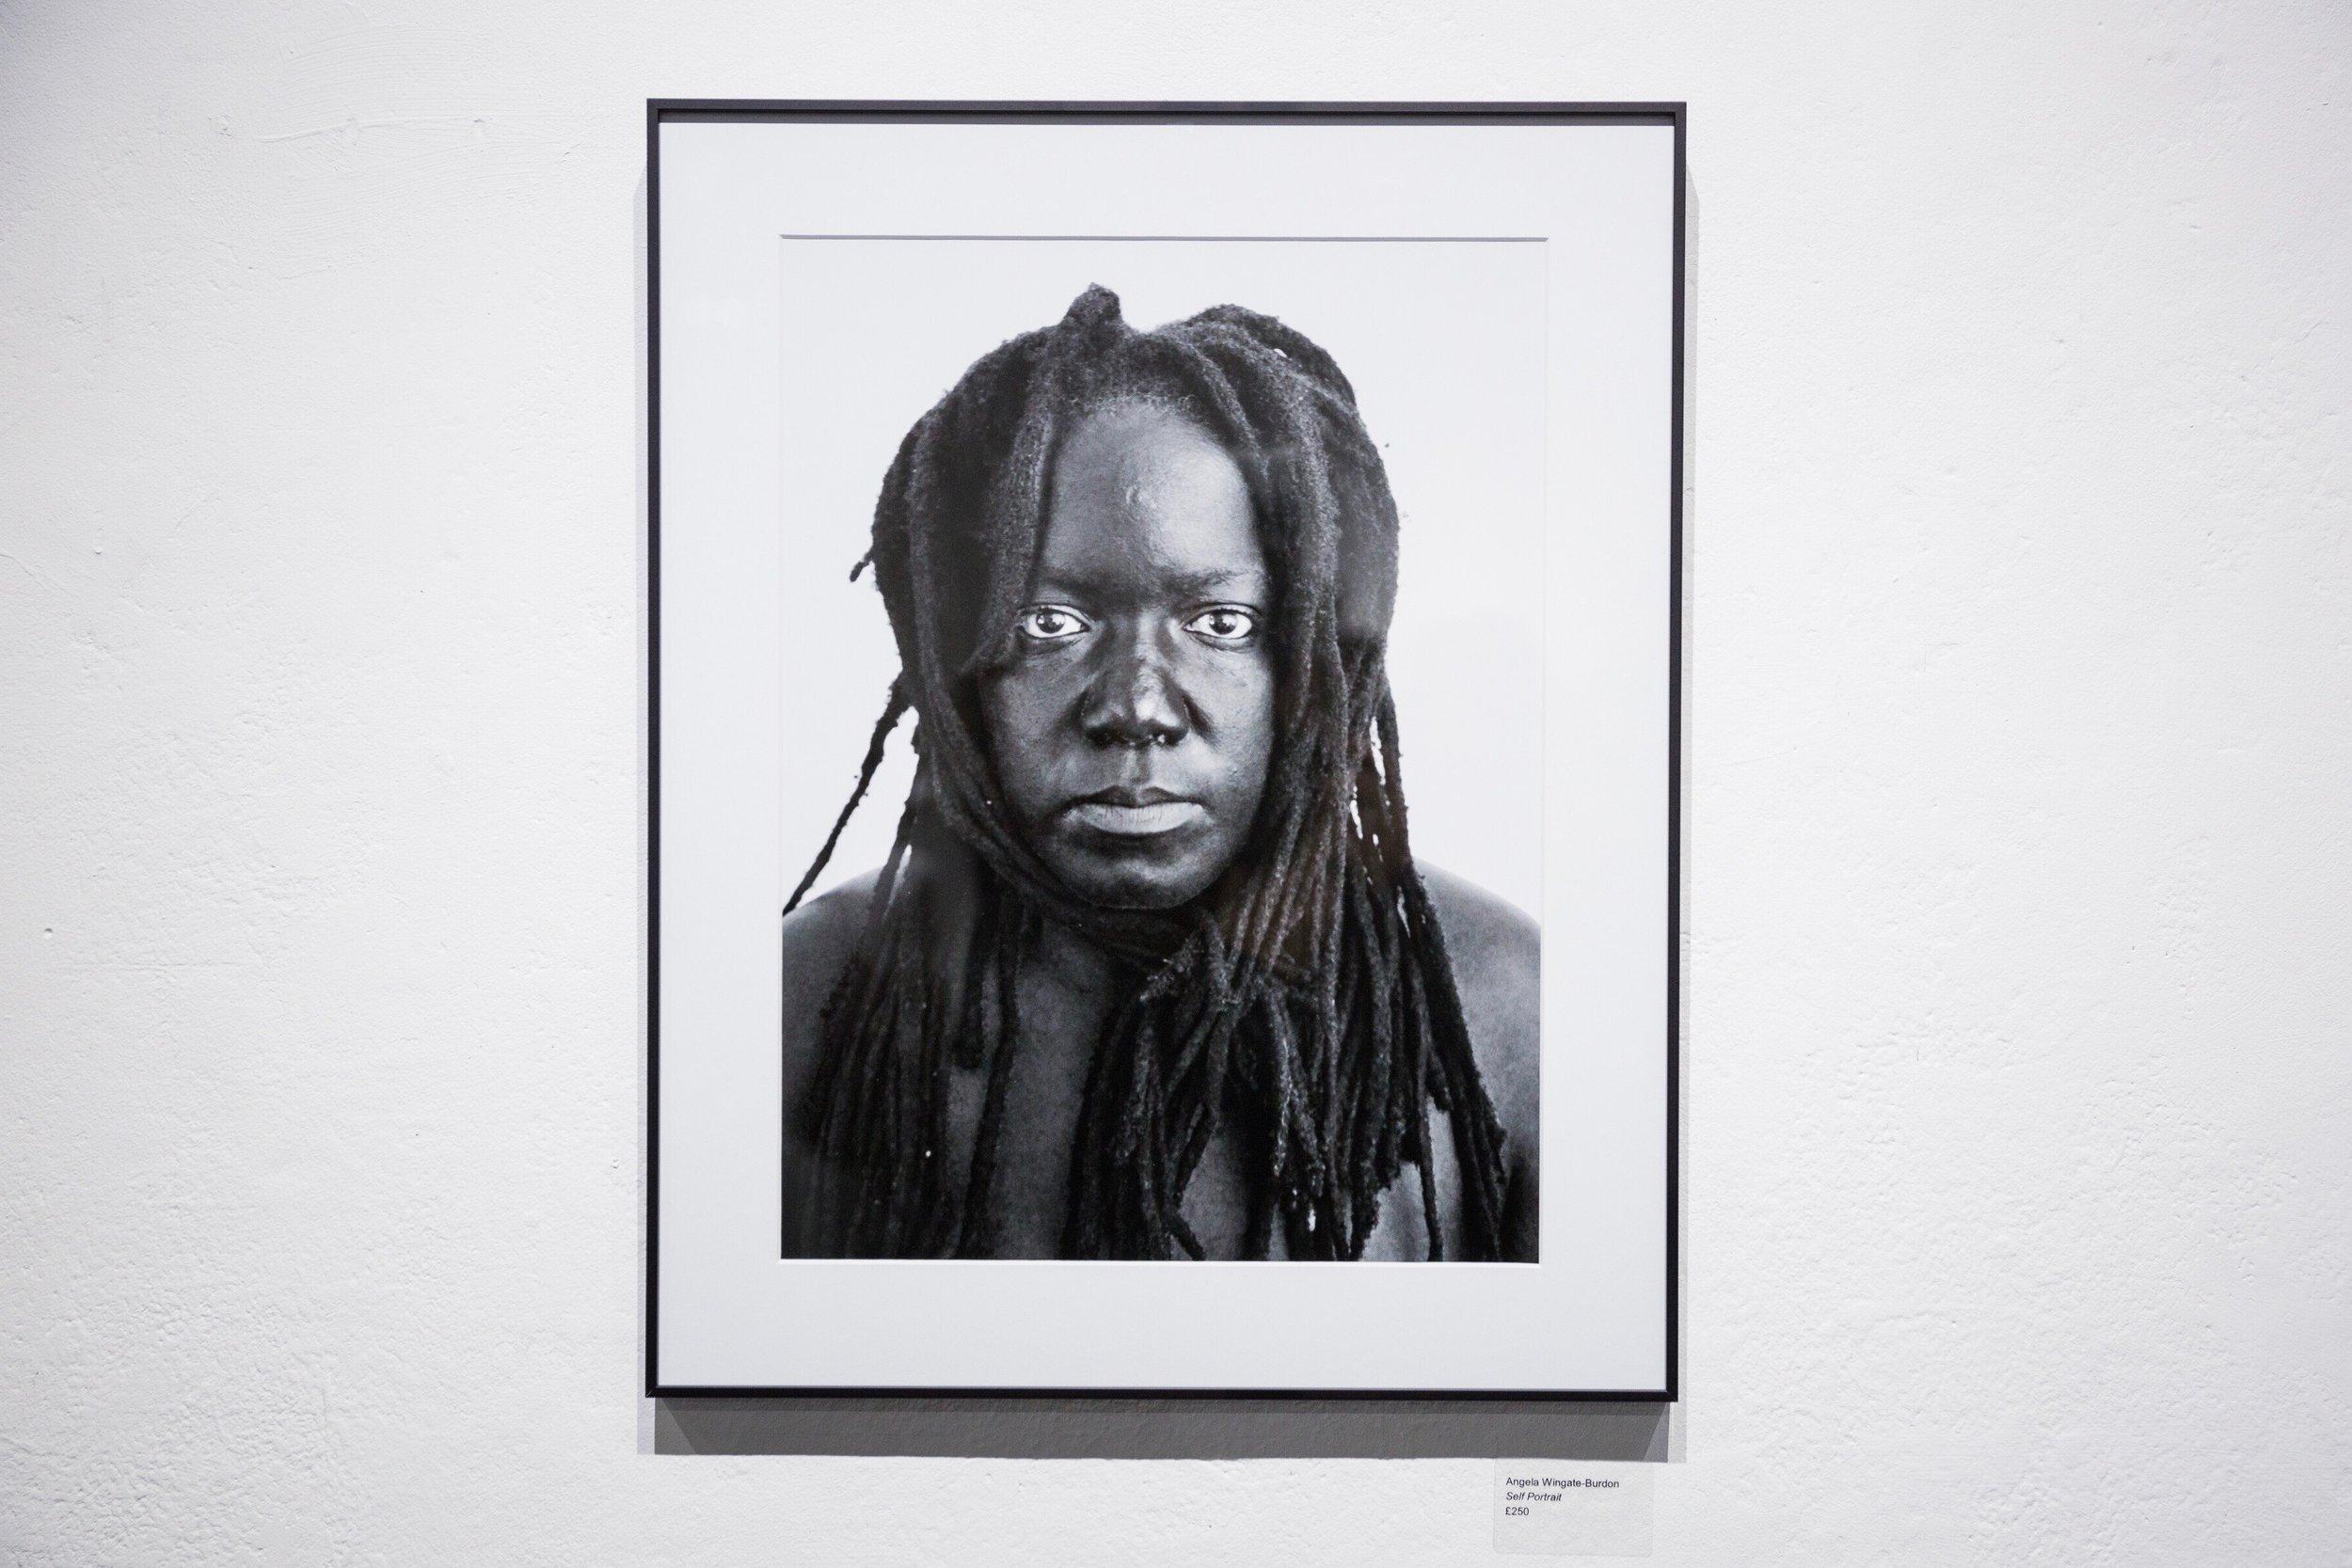 Self-portrait, Angela Wingate-Burdon, 2017. Image credit: Greg Abramowicz